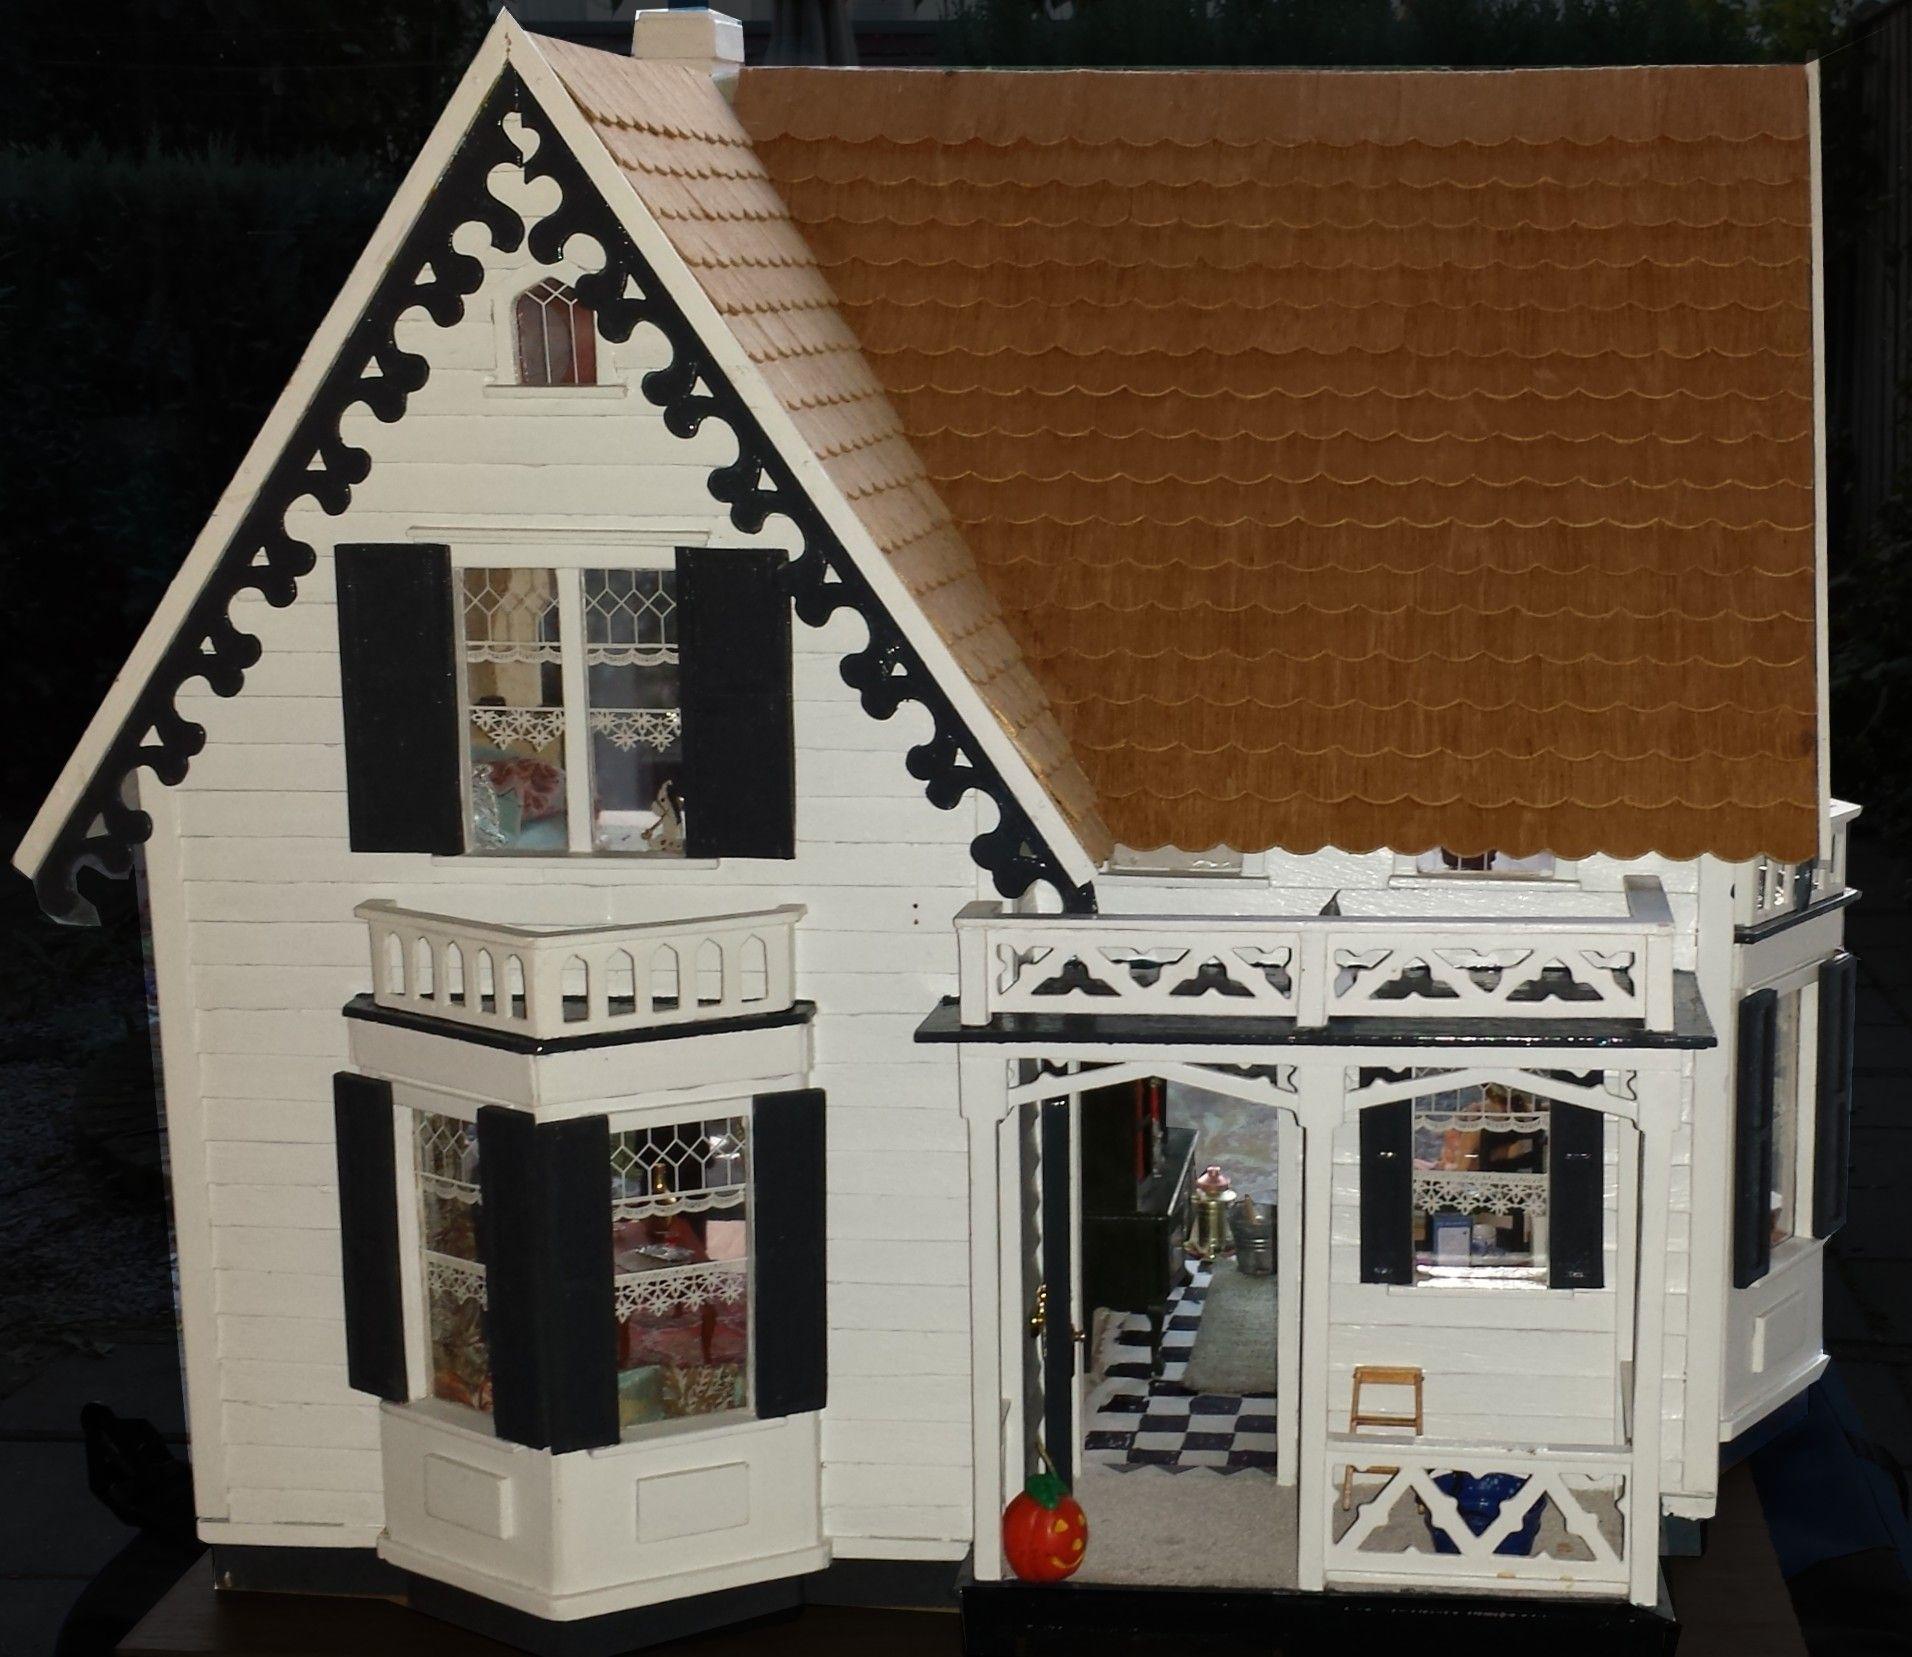 Mijn Eigen Westville Dollhouse. My Westville. Not Unique